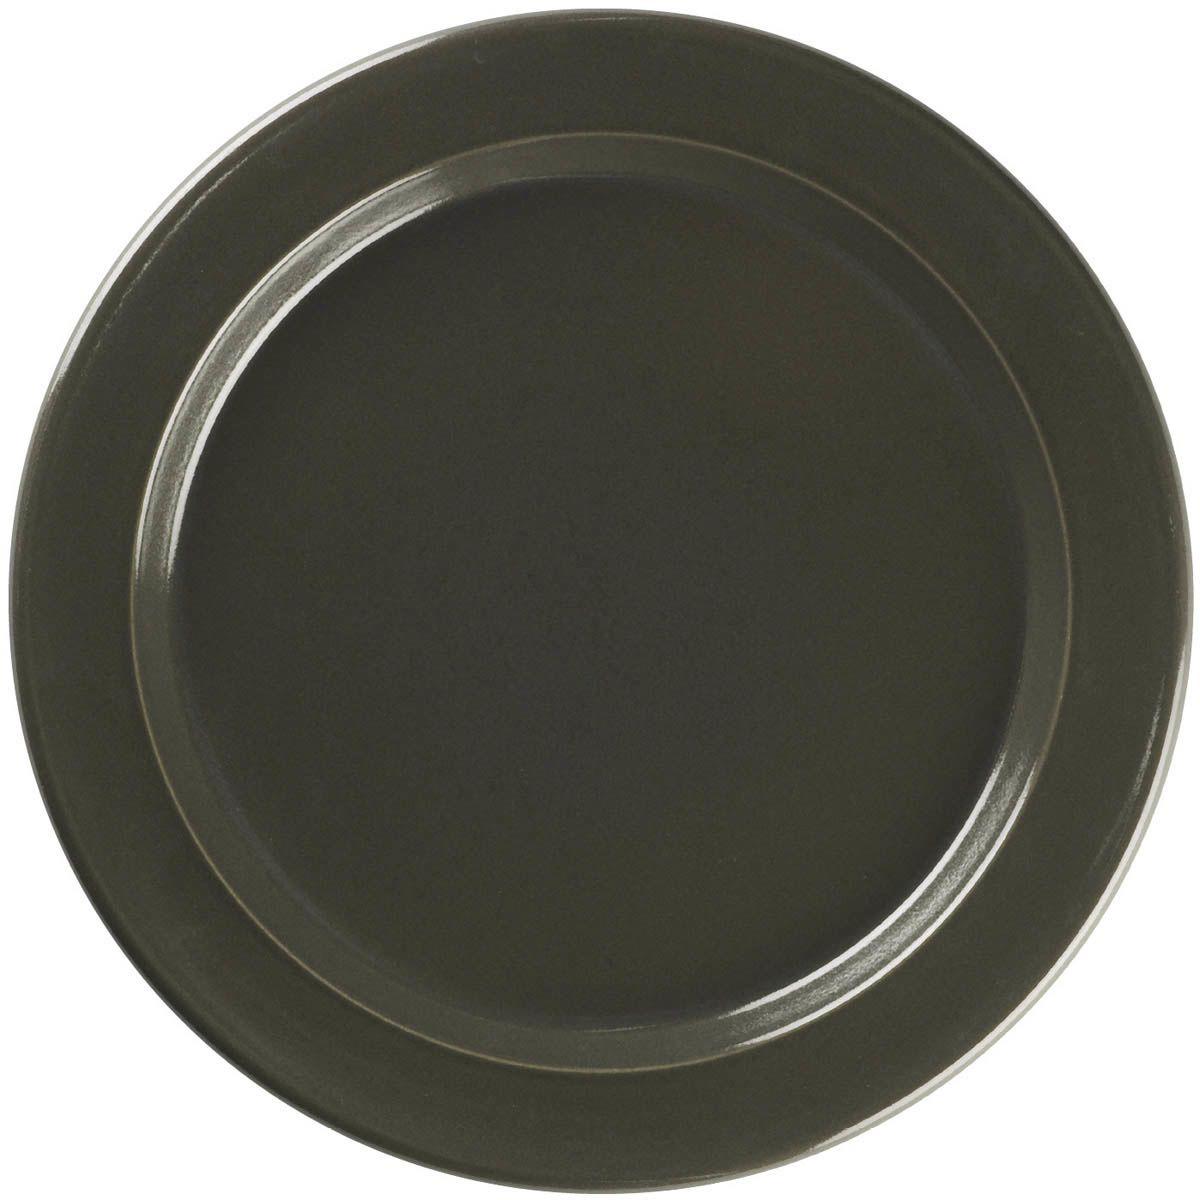 Тарелка обеденная Emile Henry Natural Chic Poivre 28 см